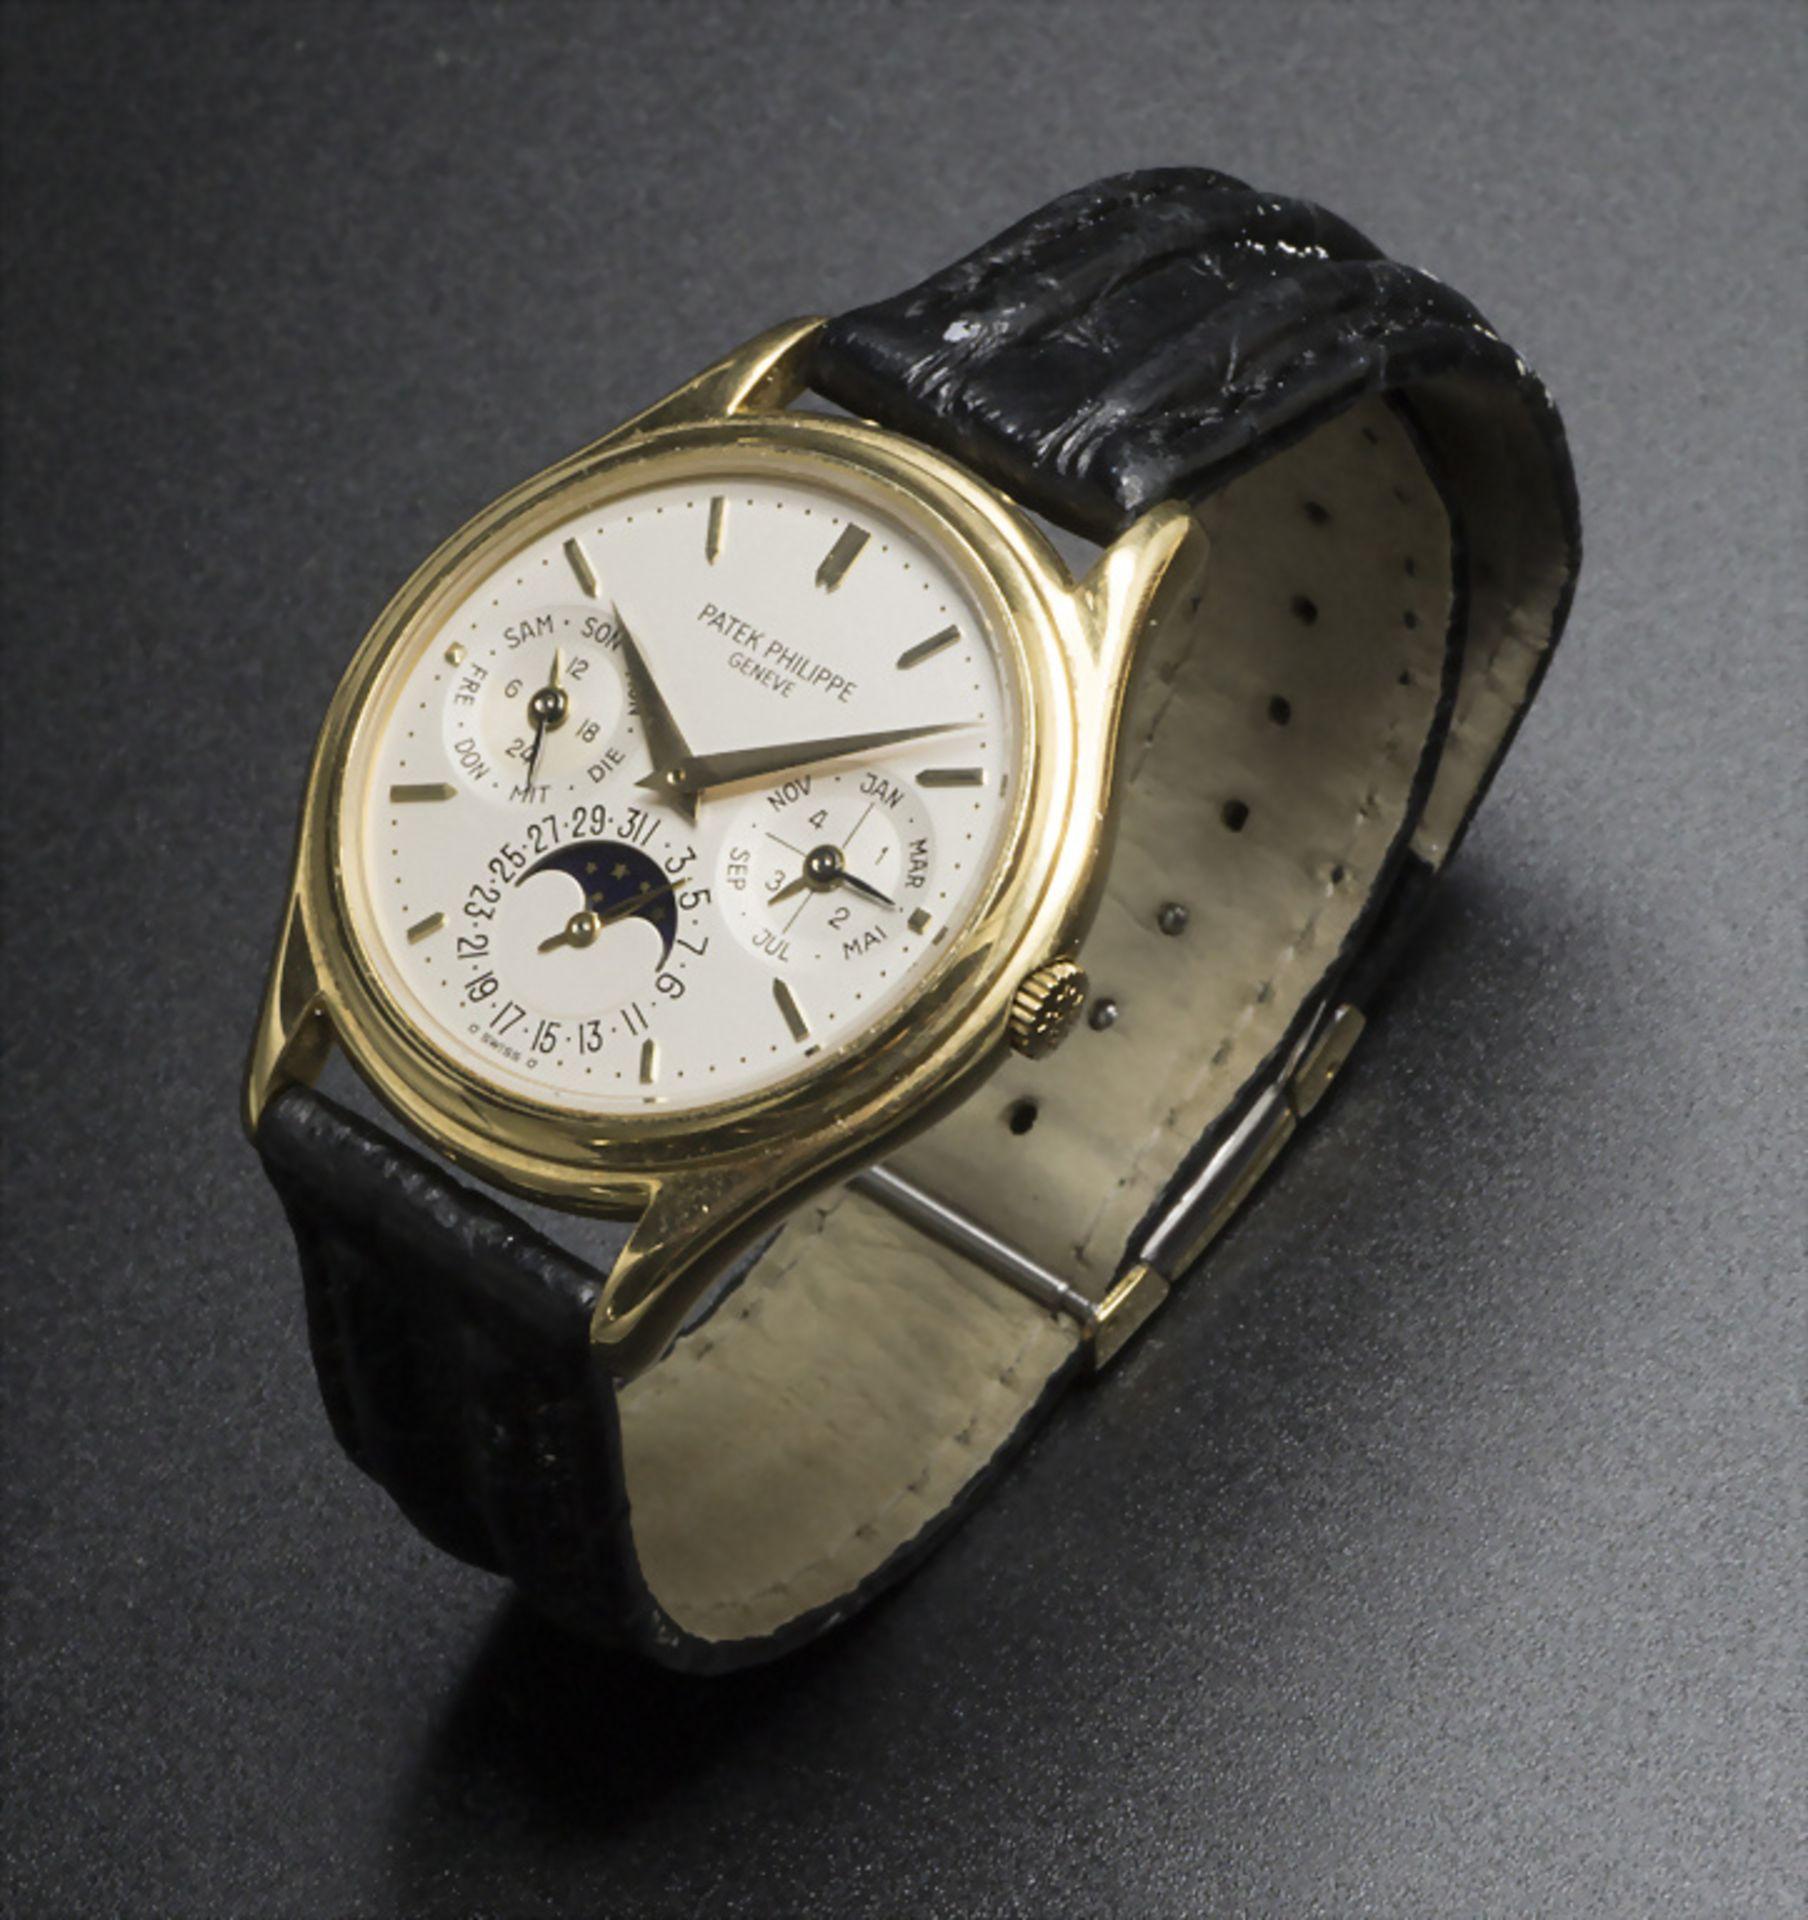 Armbanduhr, Automatik mit ewigem Kalender / A men's automatic wristwatch with perpetual ... - Image 3 of 7